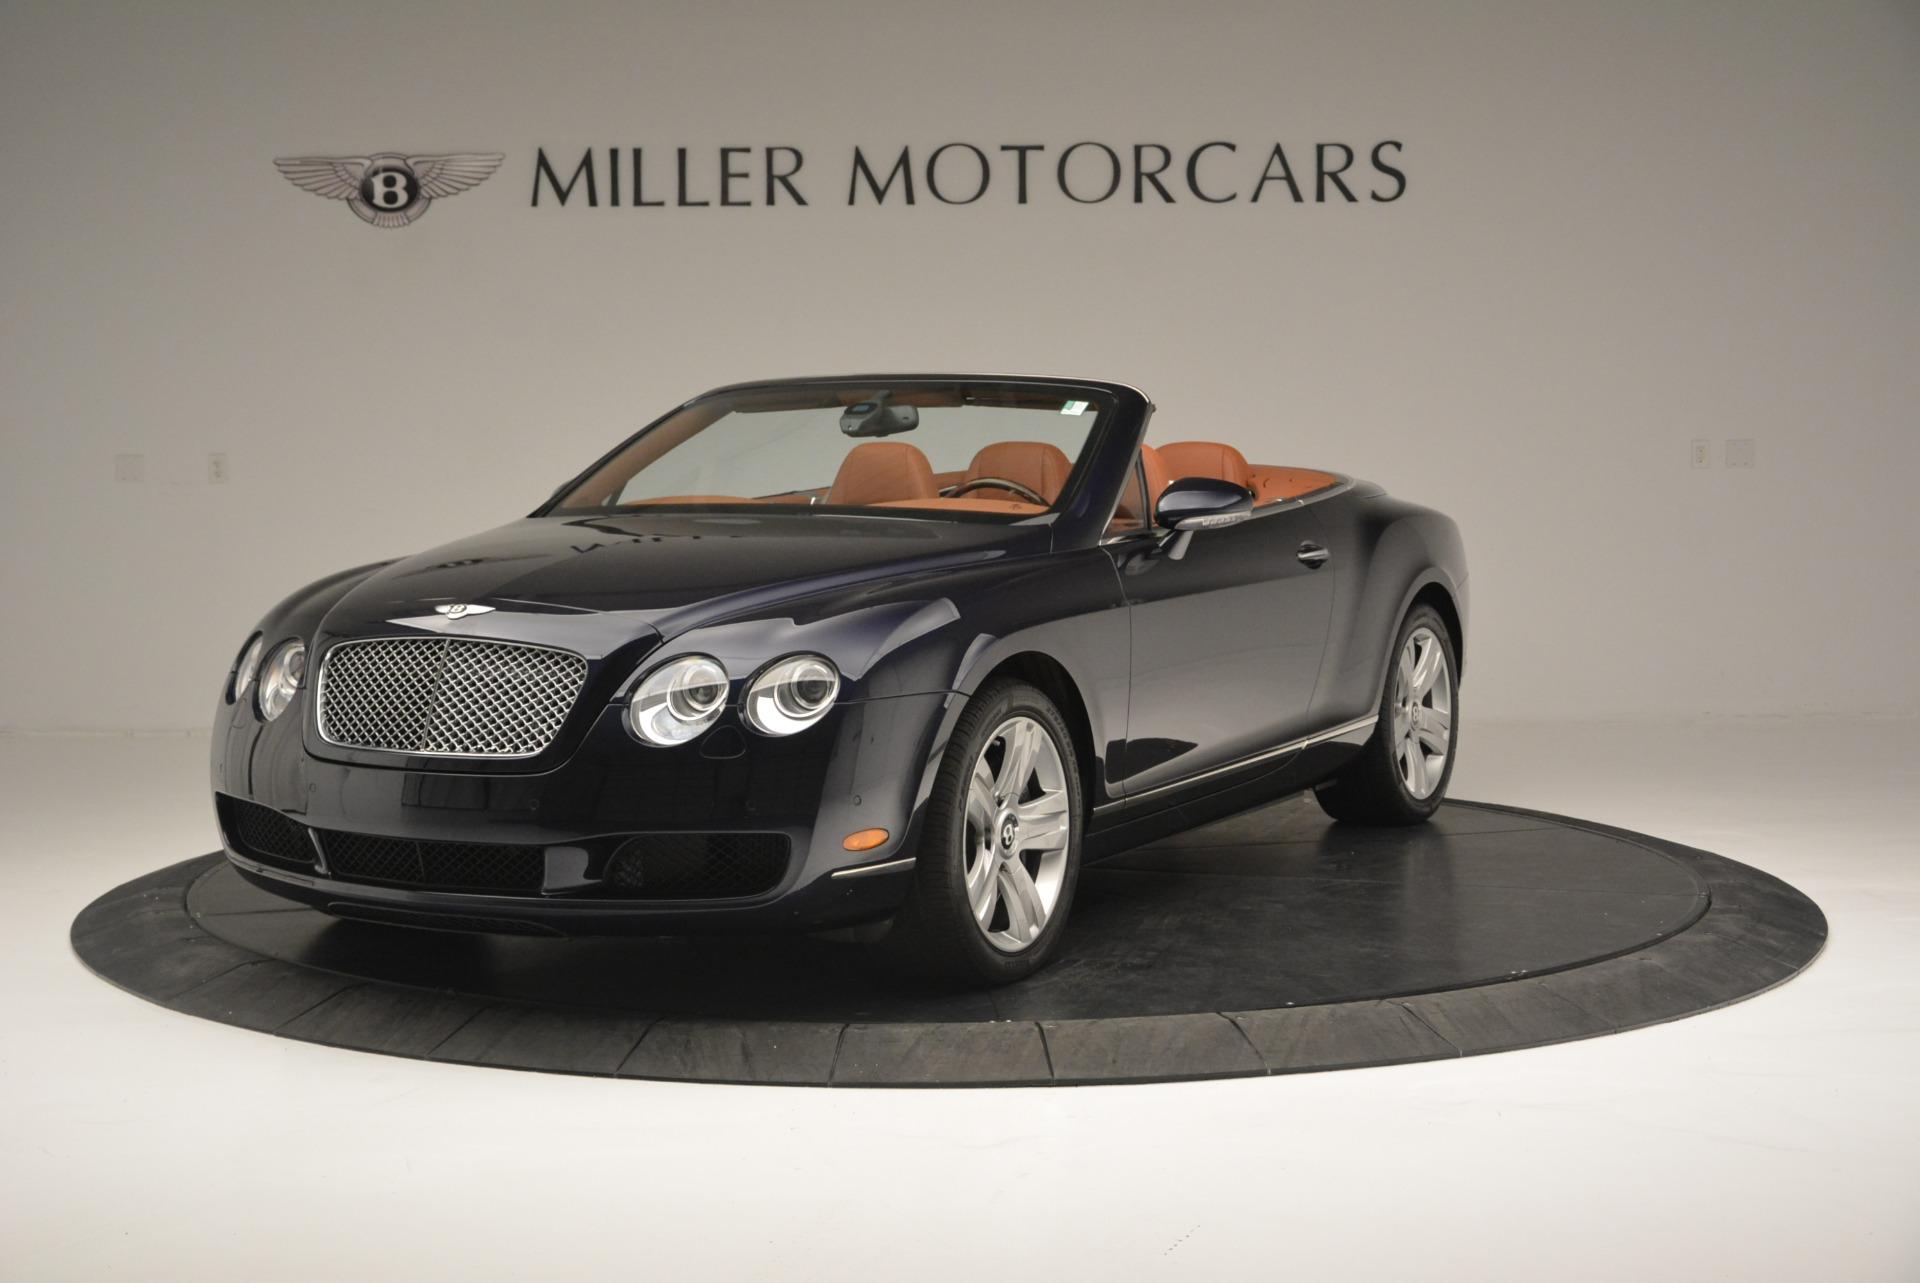 Used 2008 Bentley Continental GTC GT for sale Sold at Alfa Romeo of Westport in Westport CT 06880 1